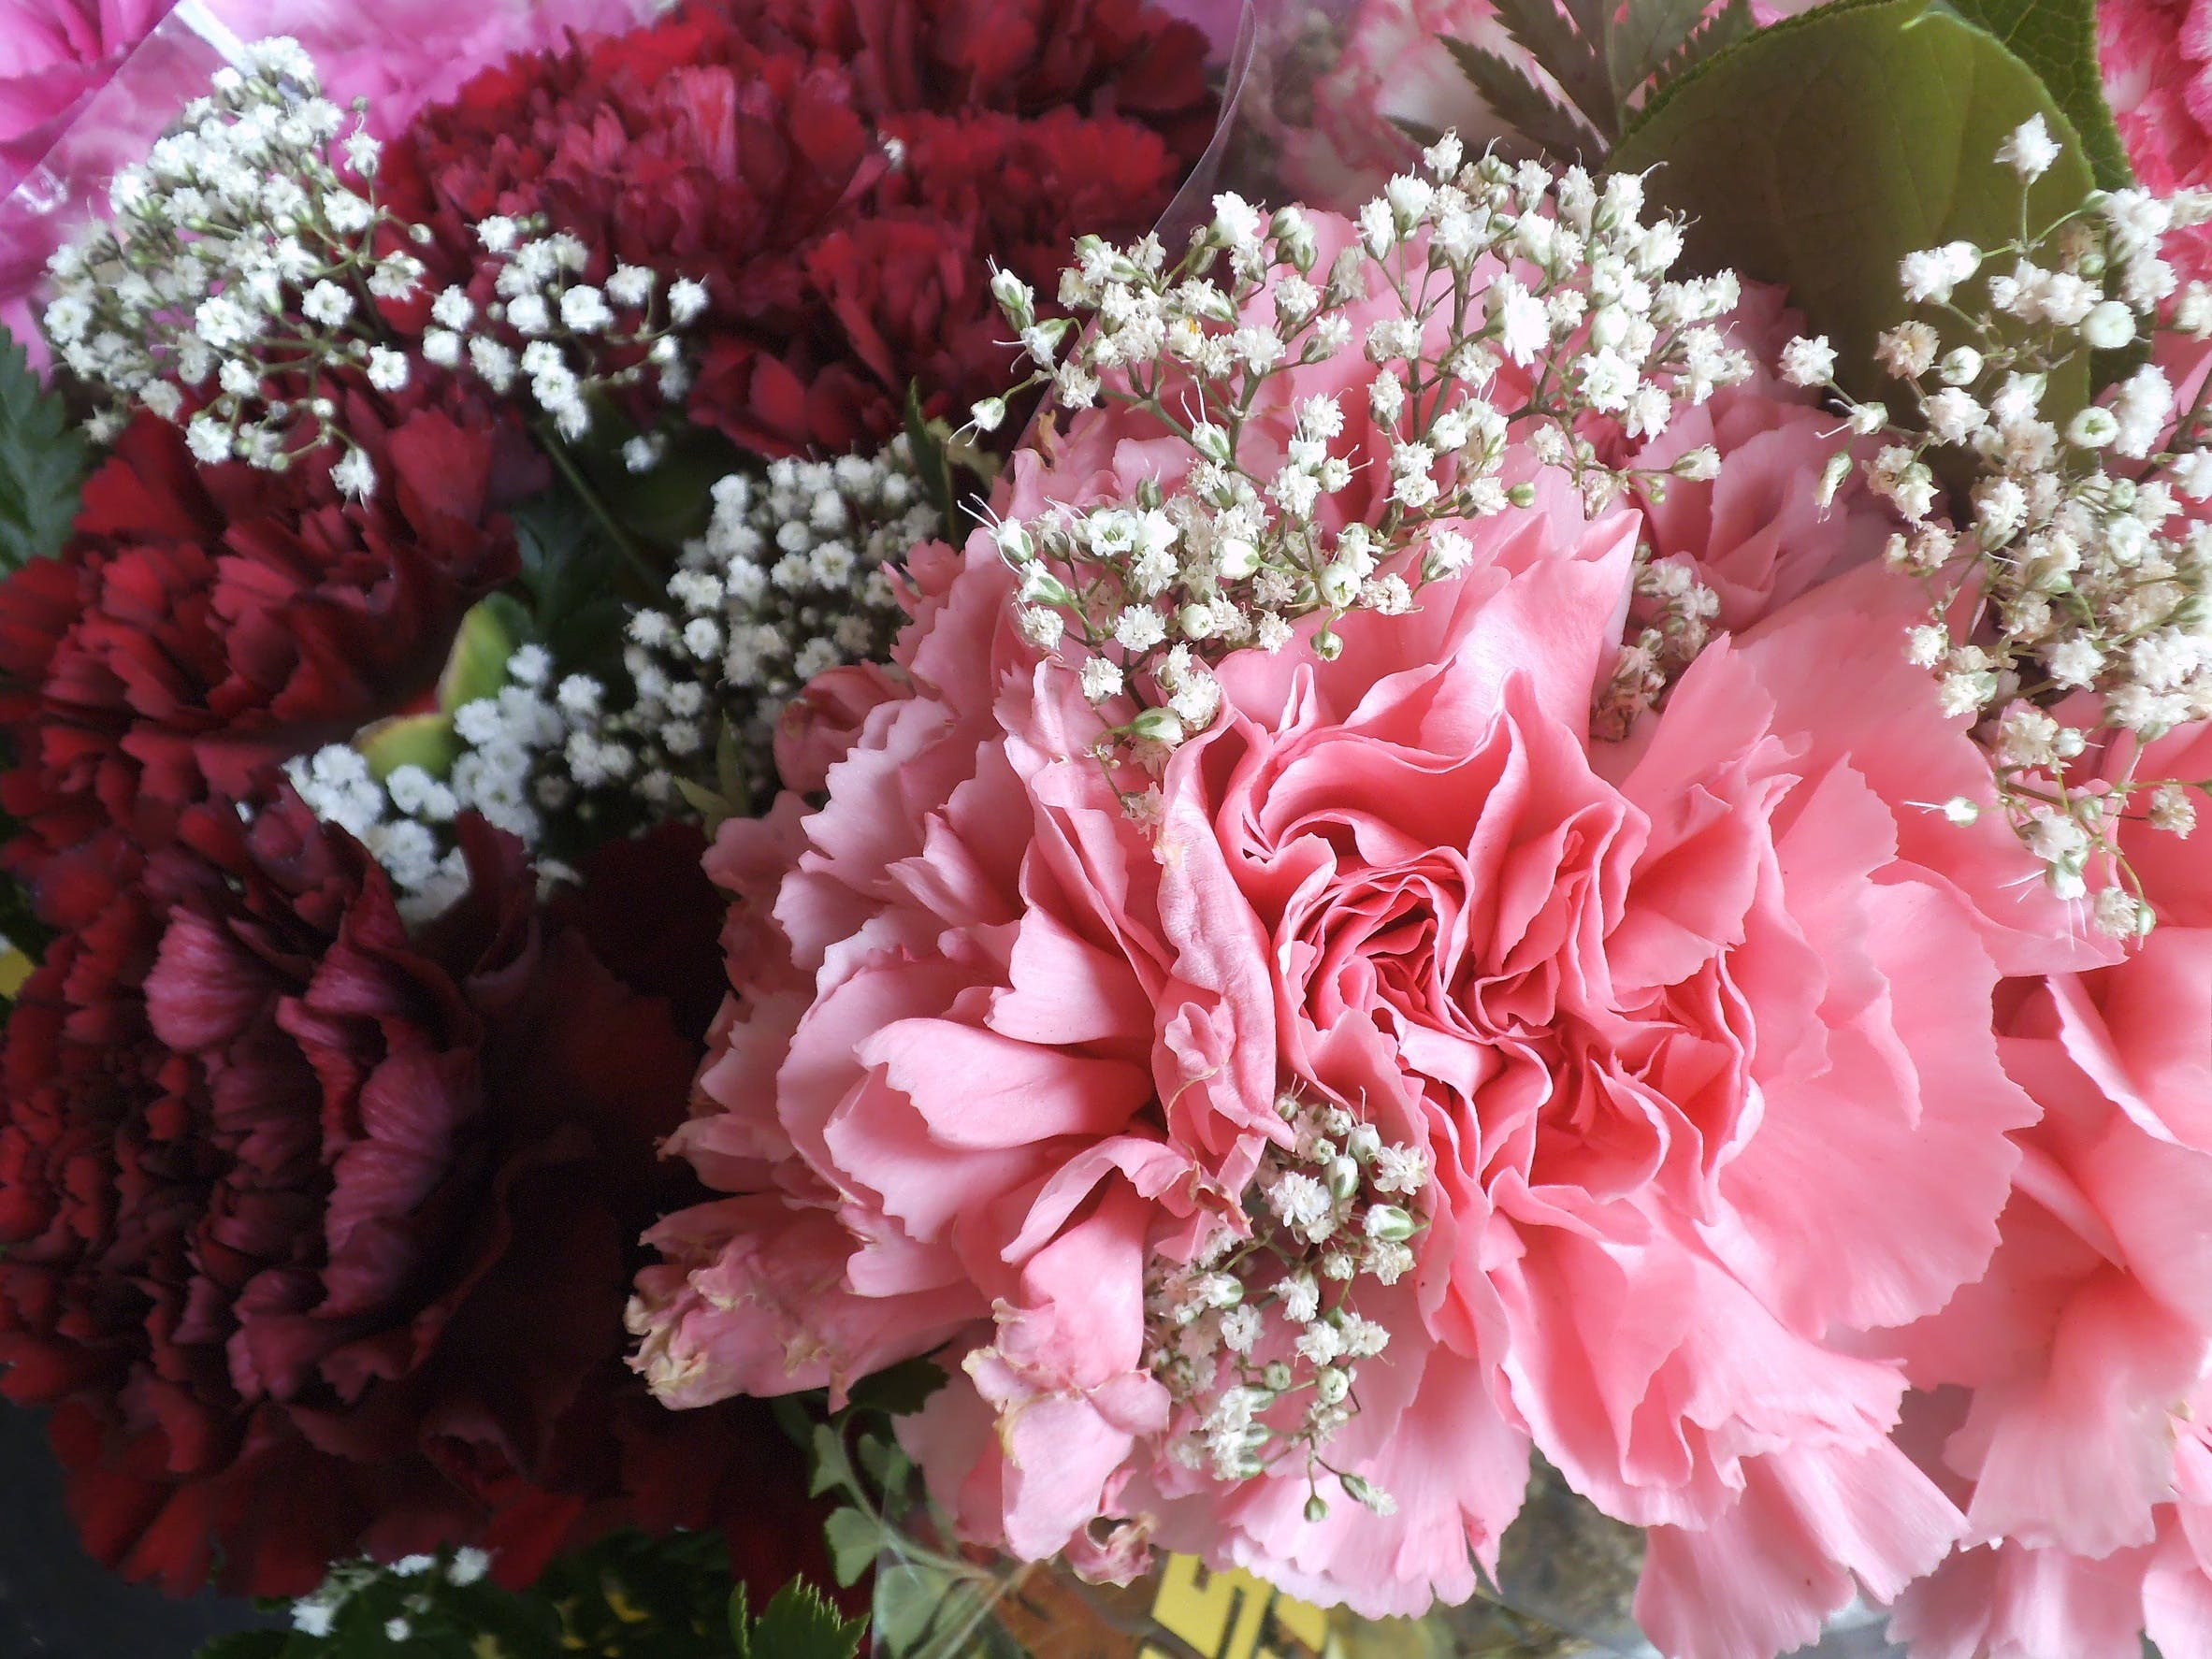 Free stock photo of love, romantic, petals, gift